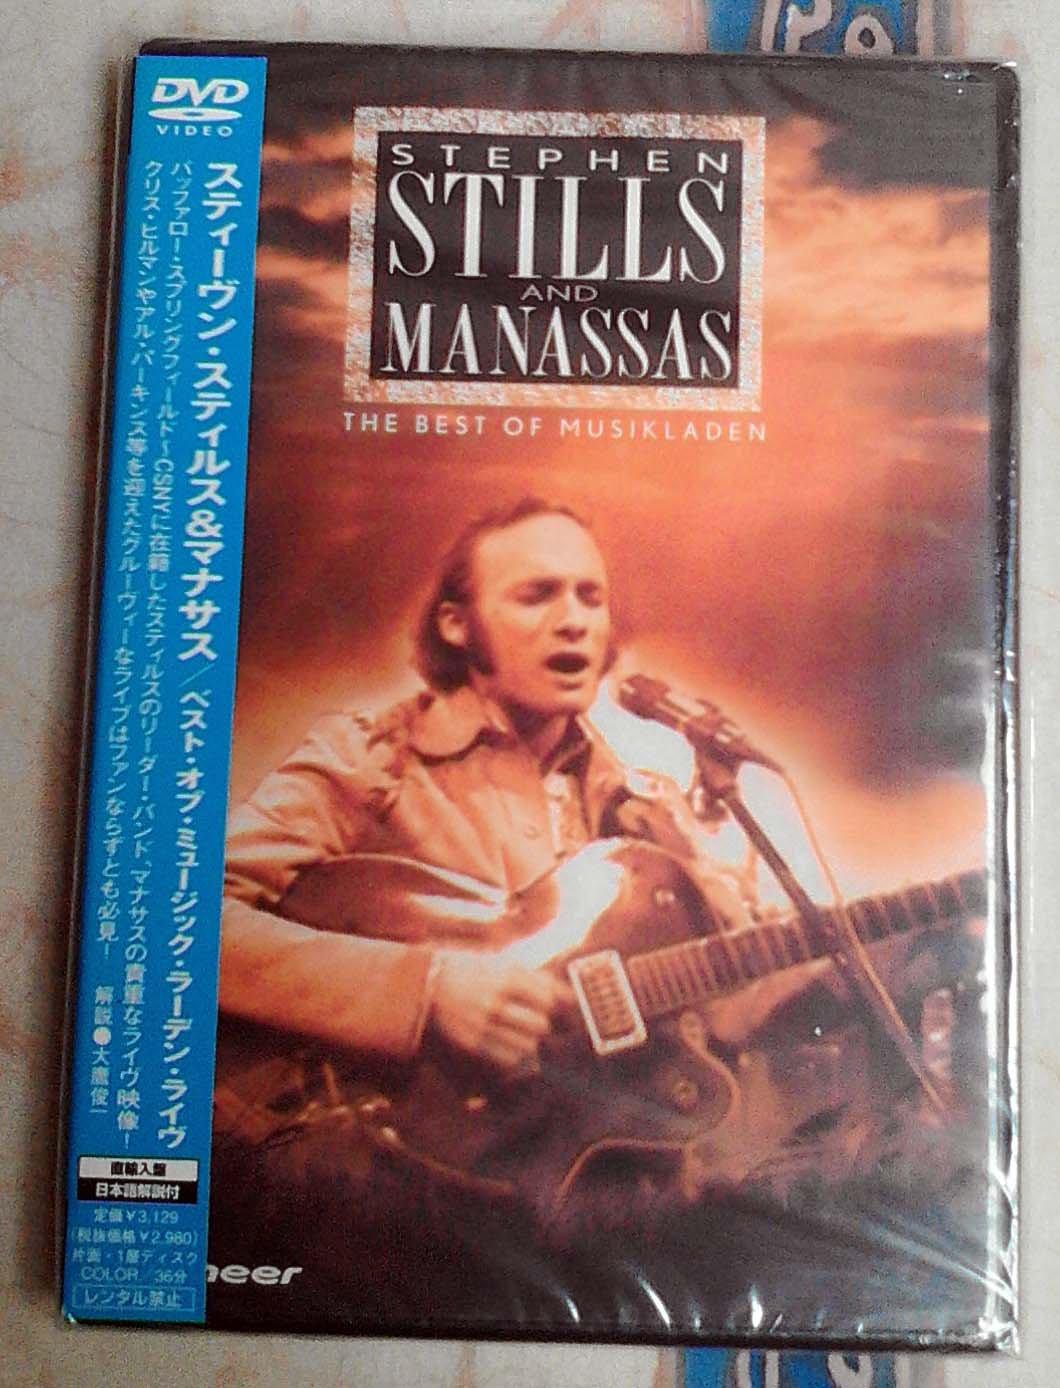 Stephen Stills And Manassas The Best of MusikLaden DVD